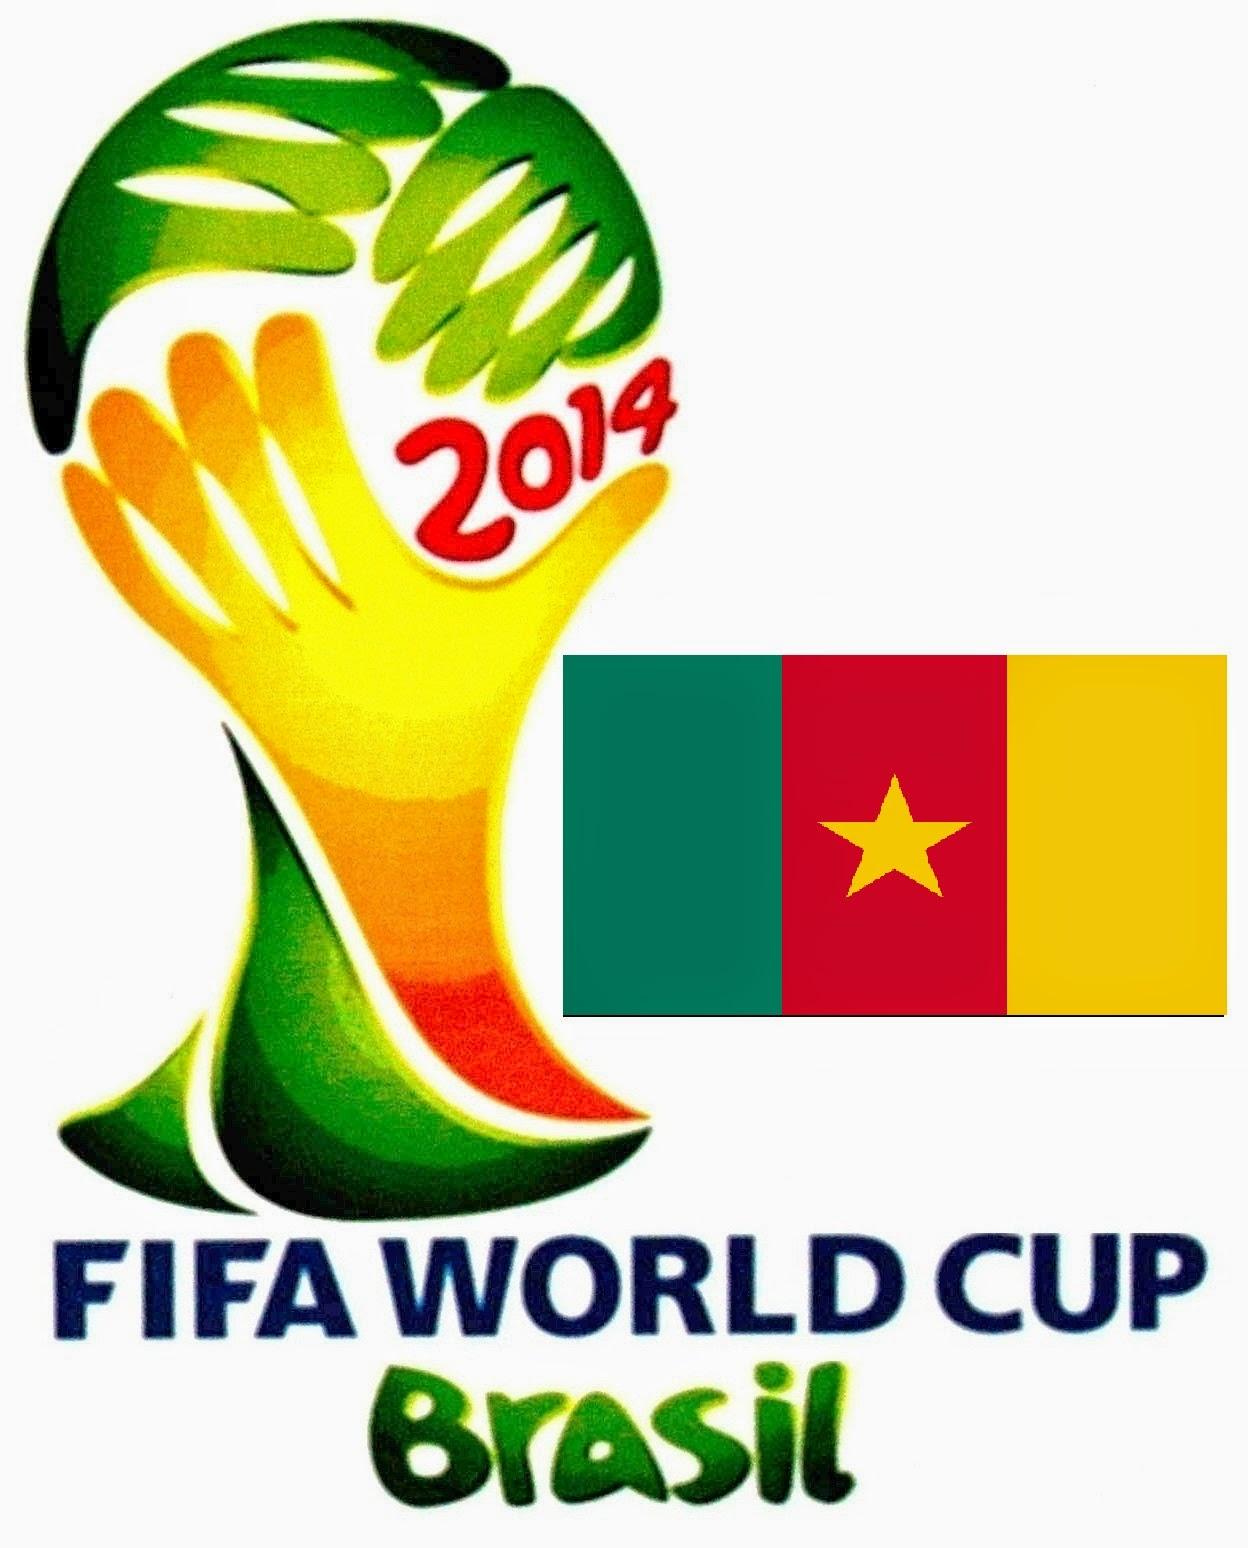 Daftar Nama Pemain Timnas Kamerun Piala Dunia 2014